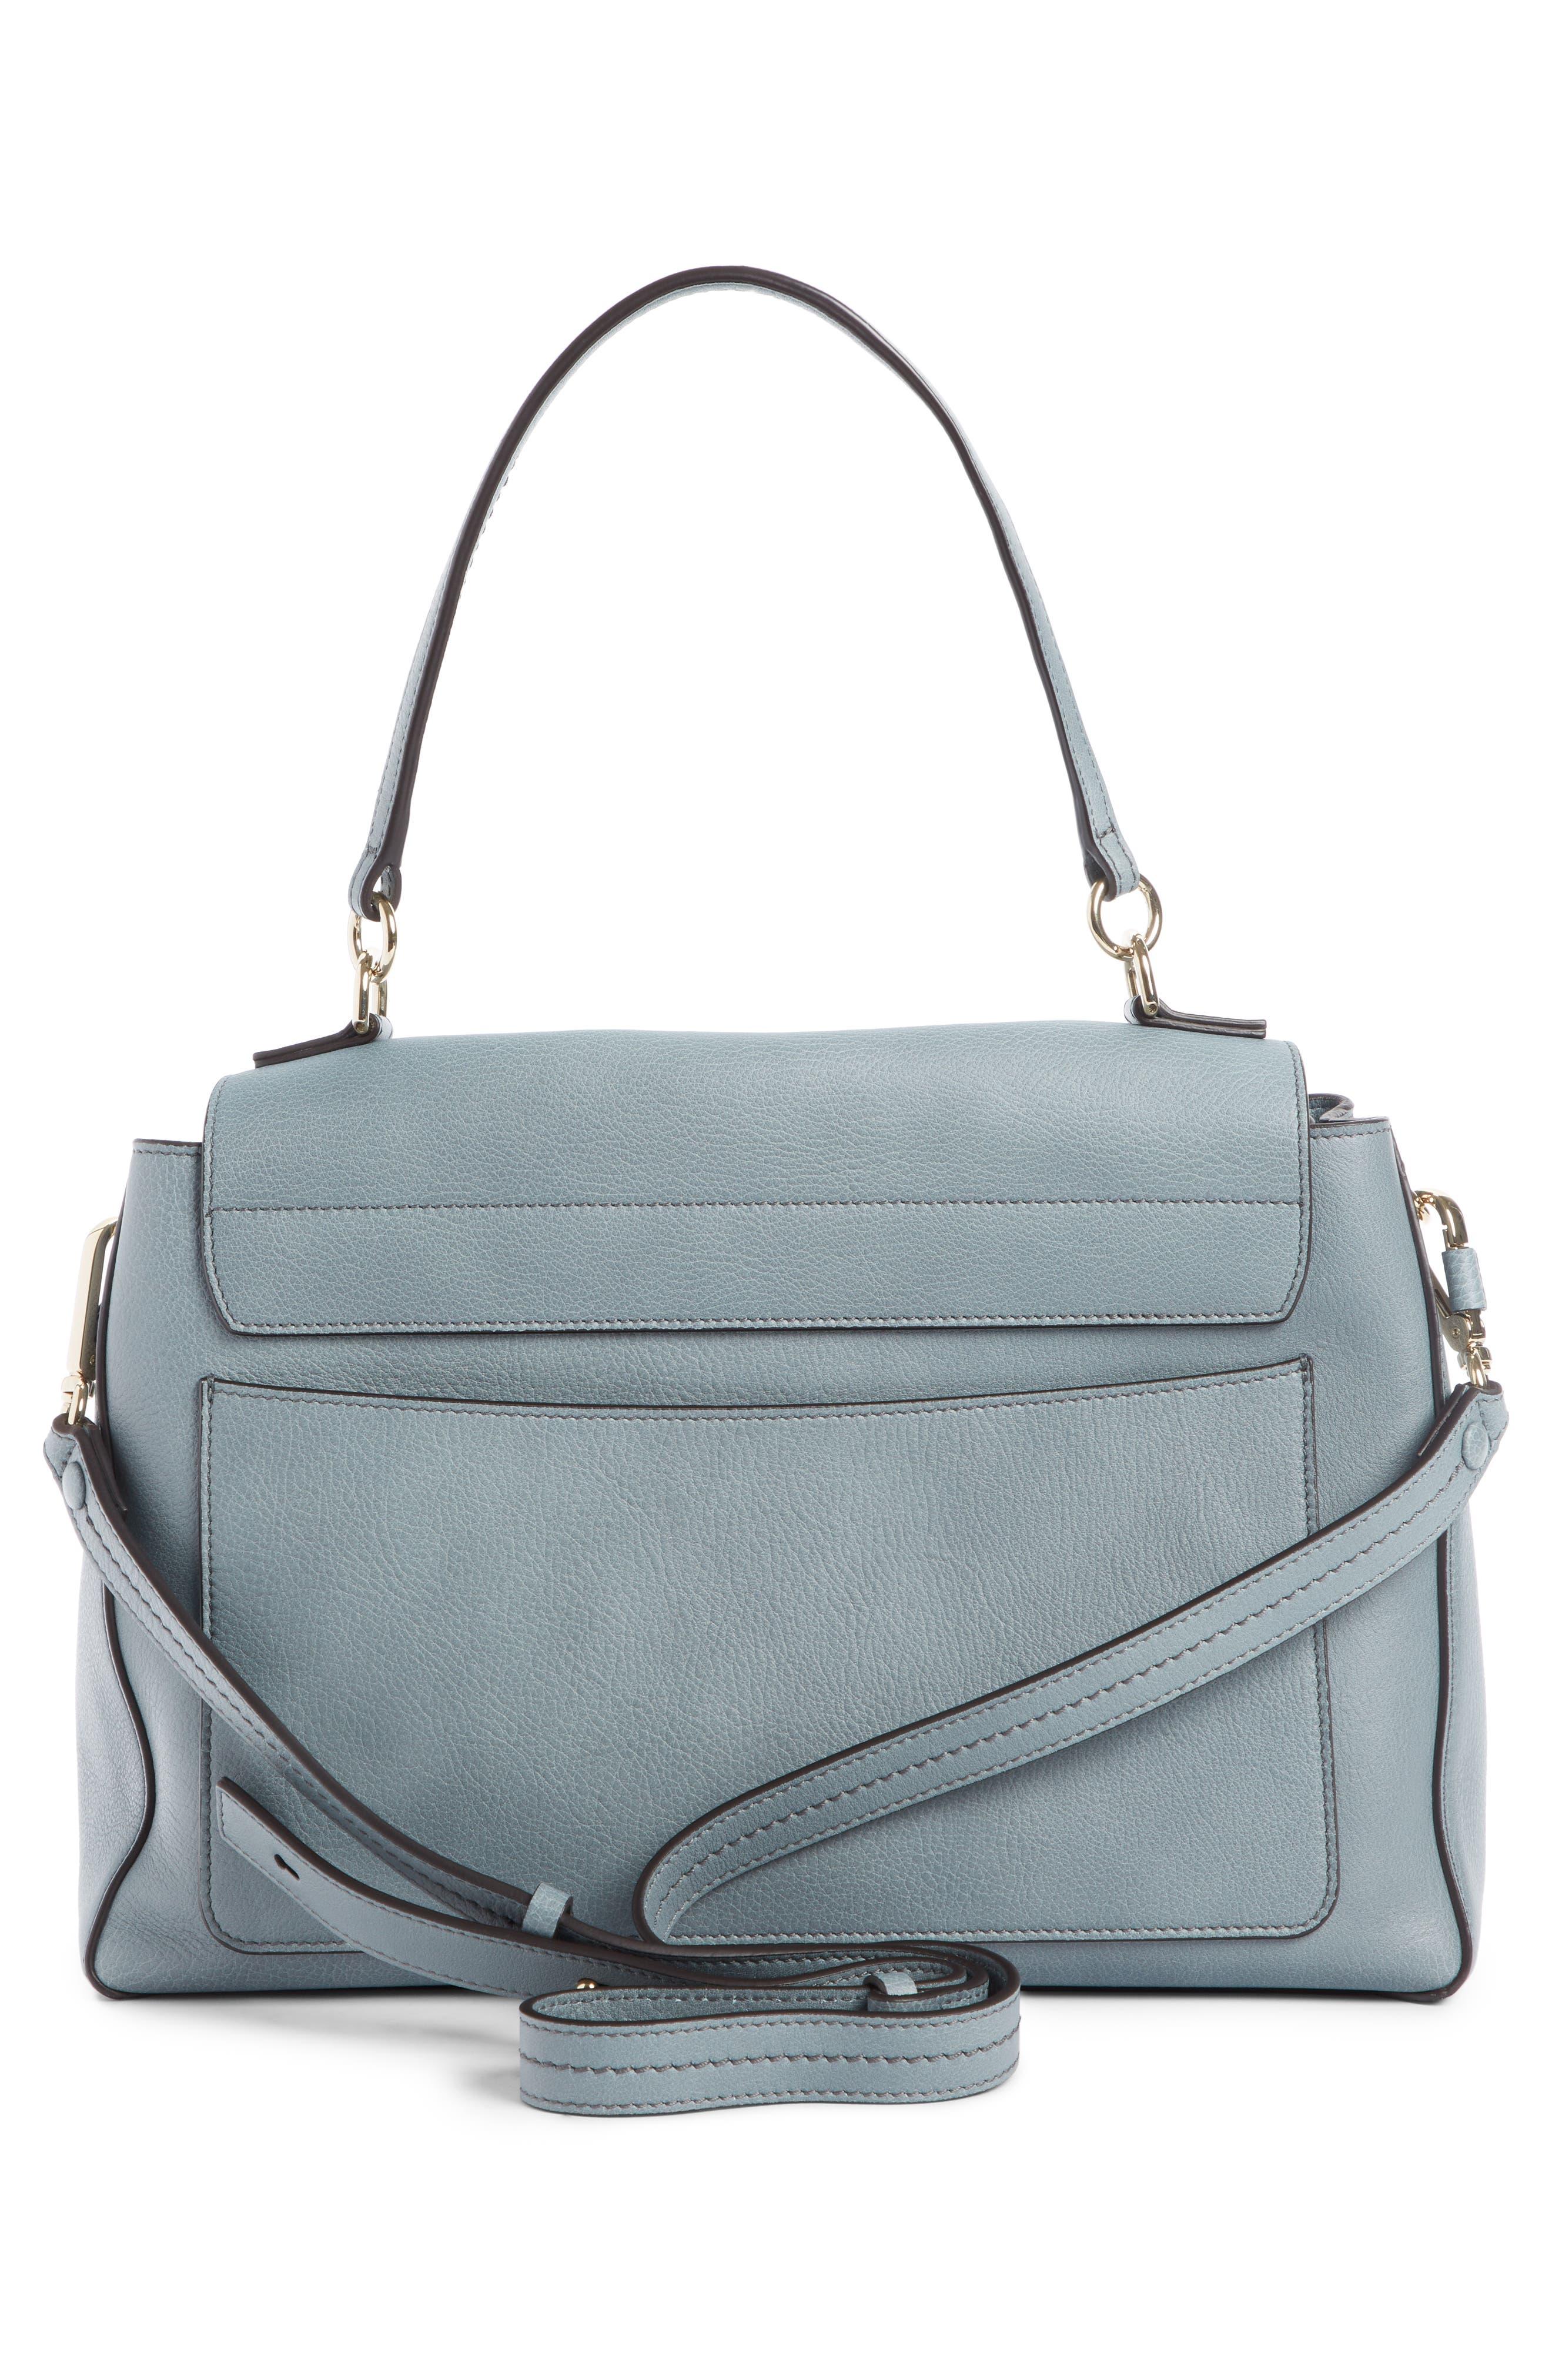 Medium Faye Leather Shoulder Bag,                             Alternate thumbnail 3, color,                             CLOUDY BLUE